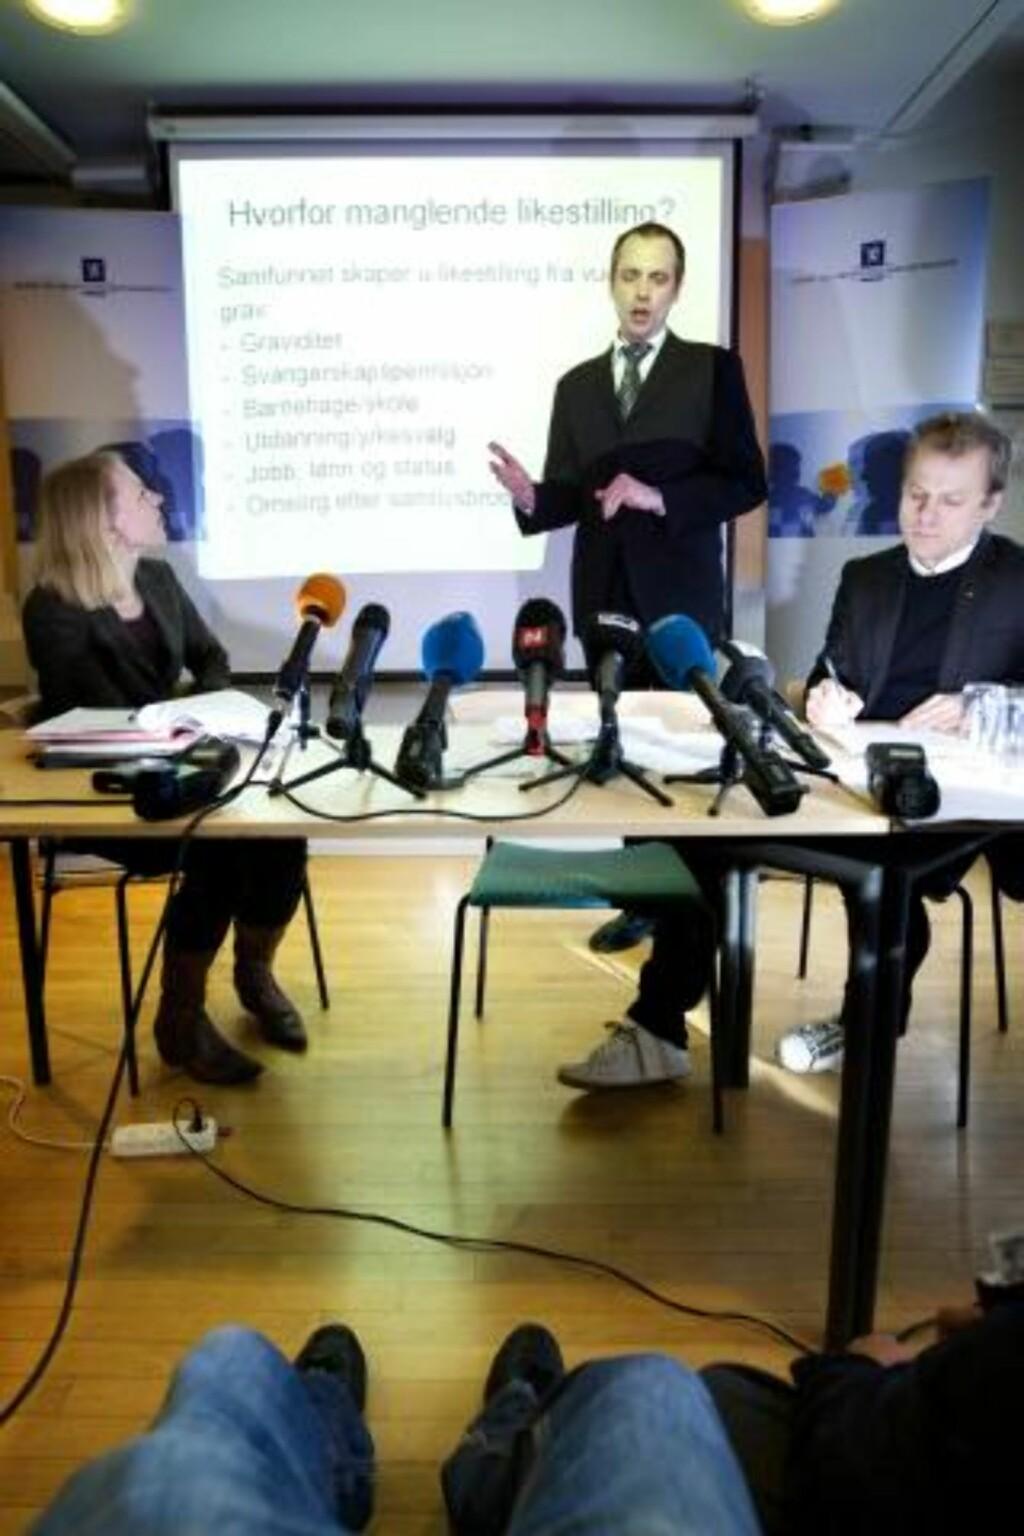 VIL IKKE DELTA 2: Arbeiderpartiets innvandringspolitiske talsmann, Arild Stokkan-Grande (i midten), vil heller ikke delta i quizen. Foto: Scanpix